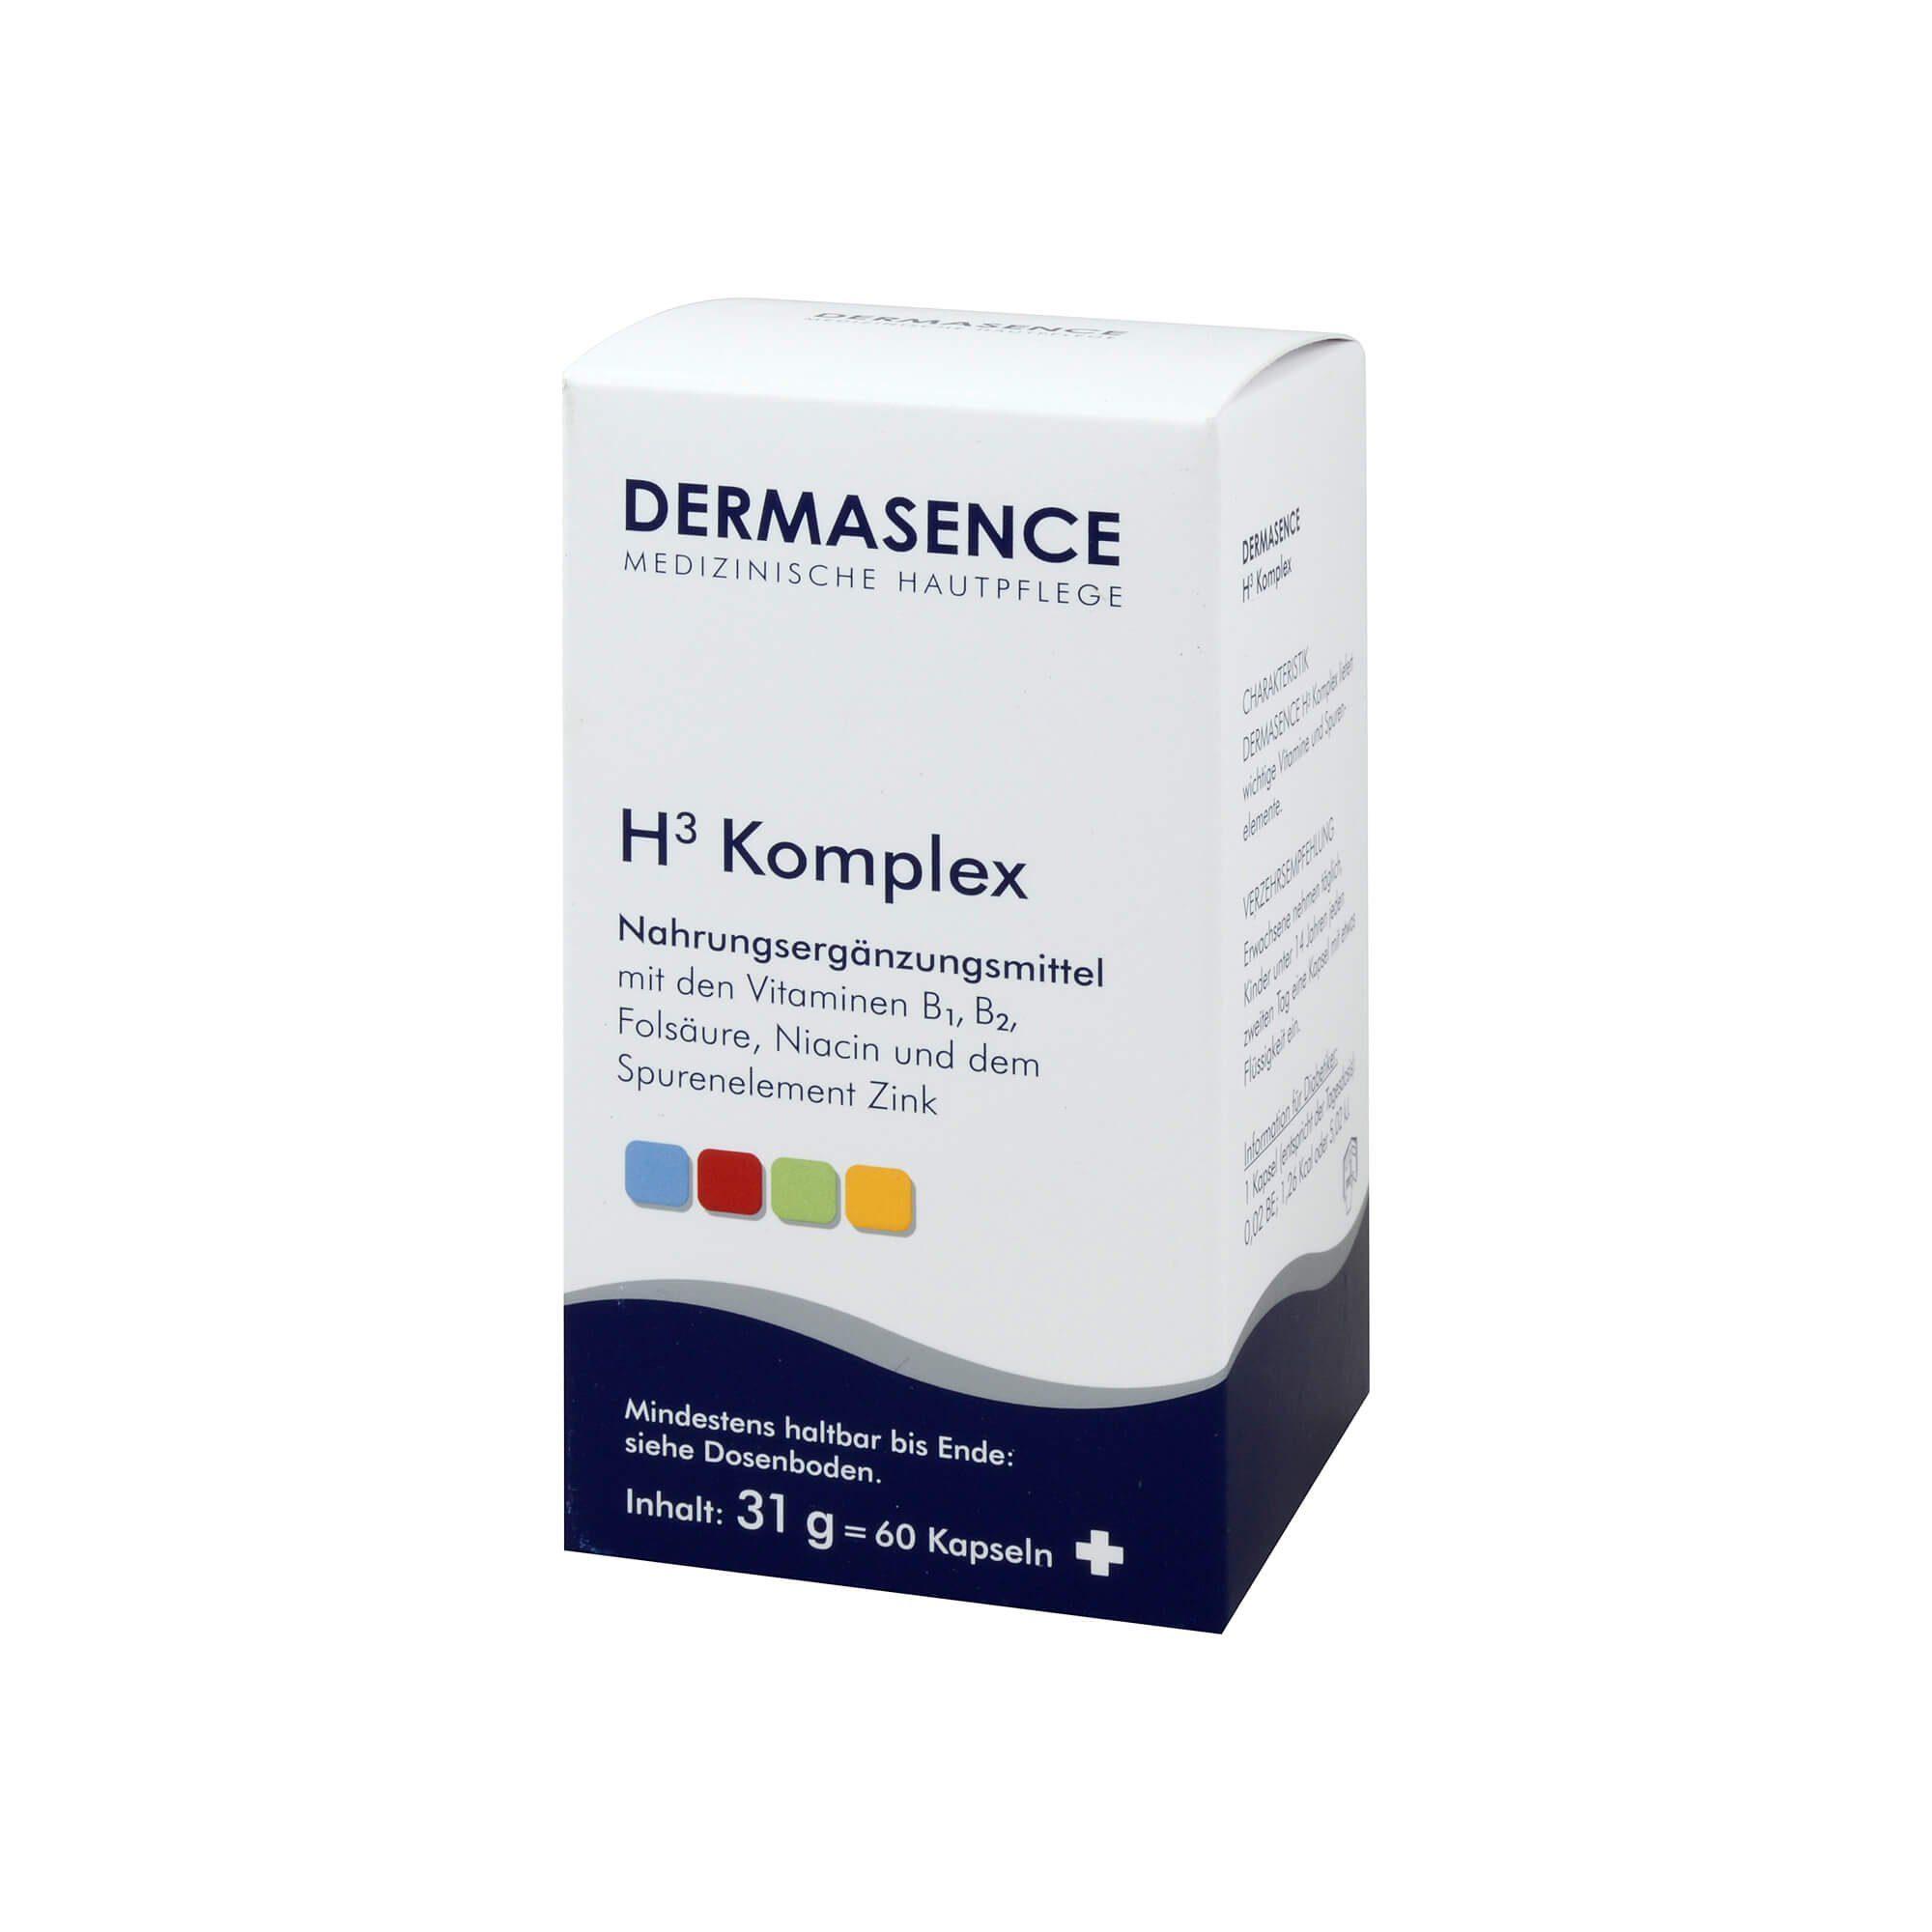 Dermasence H3 Komplex, 60 St